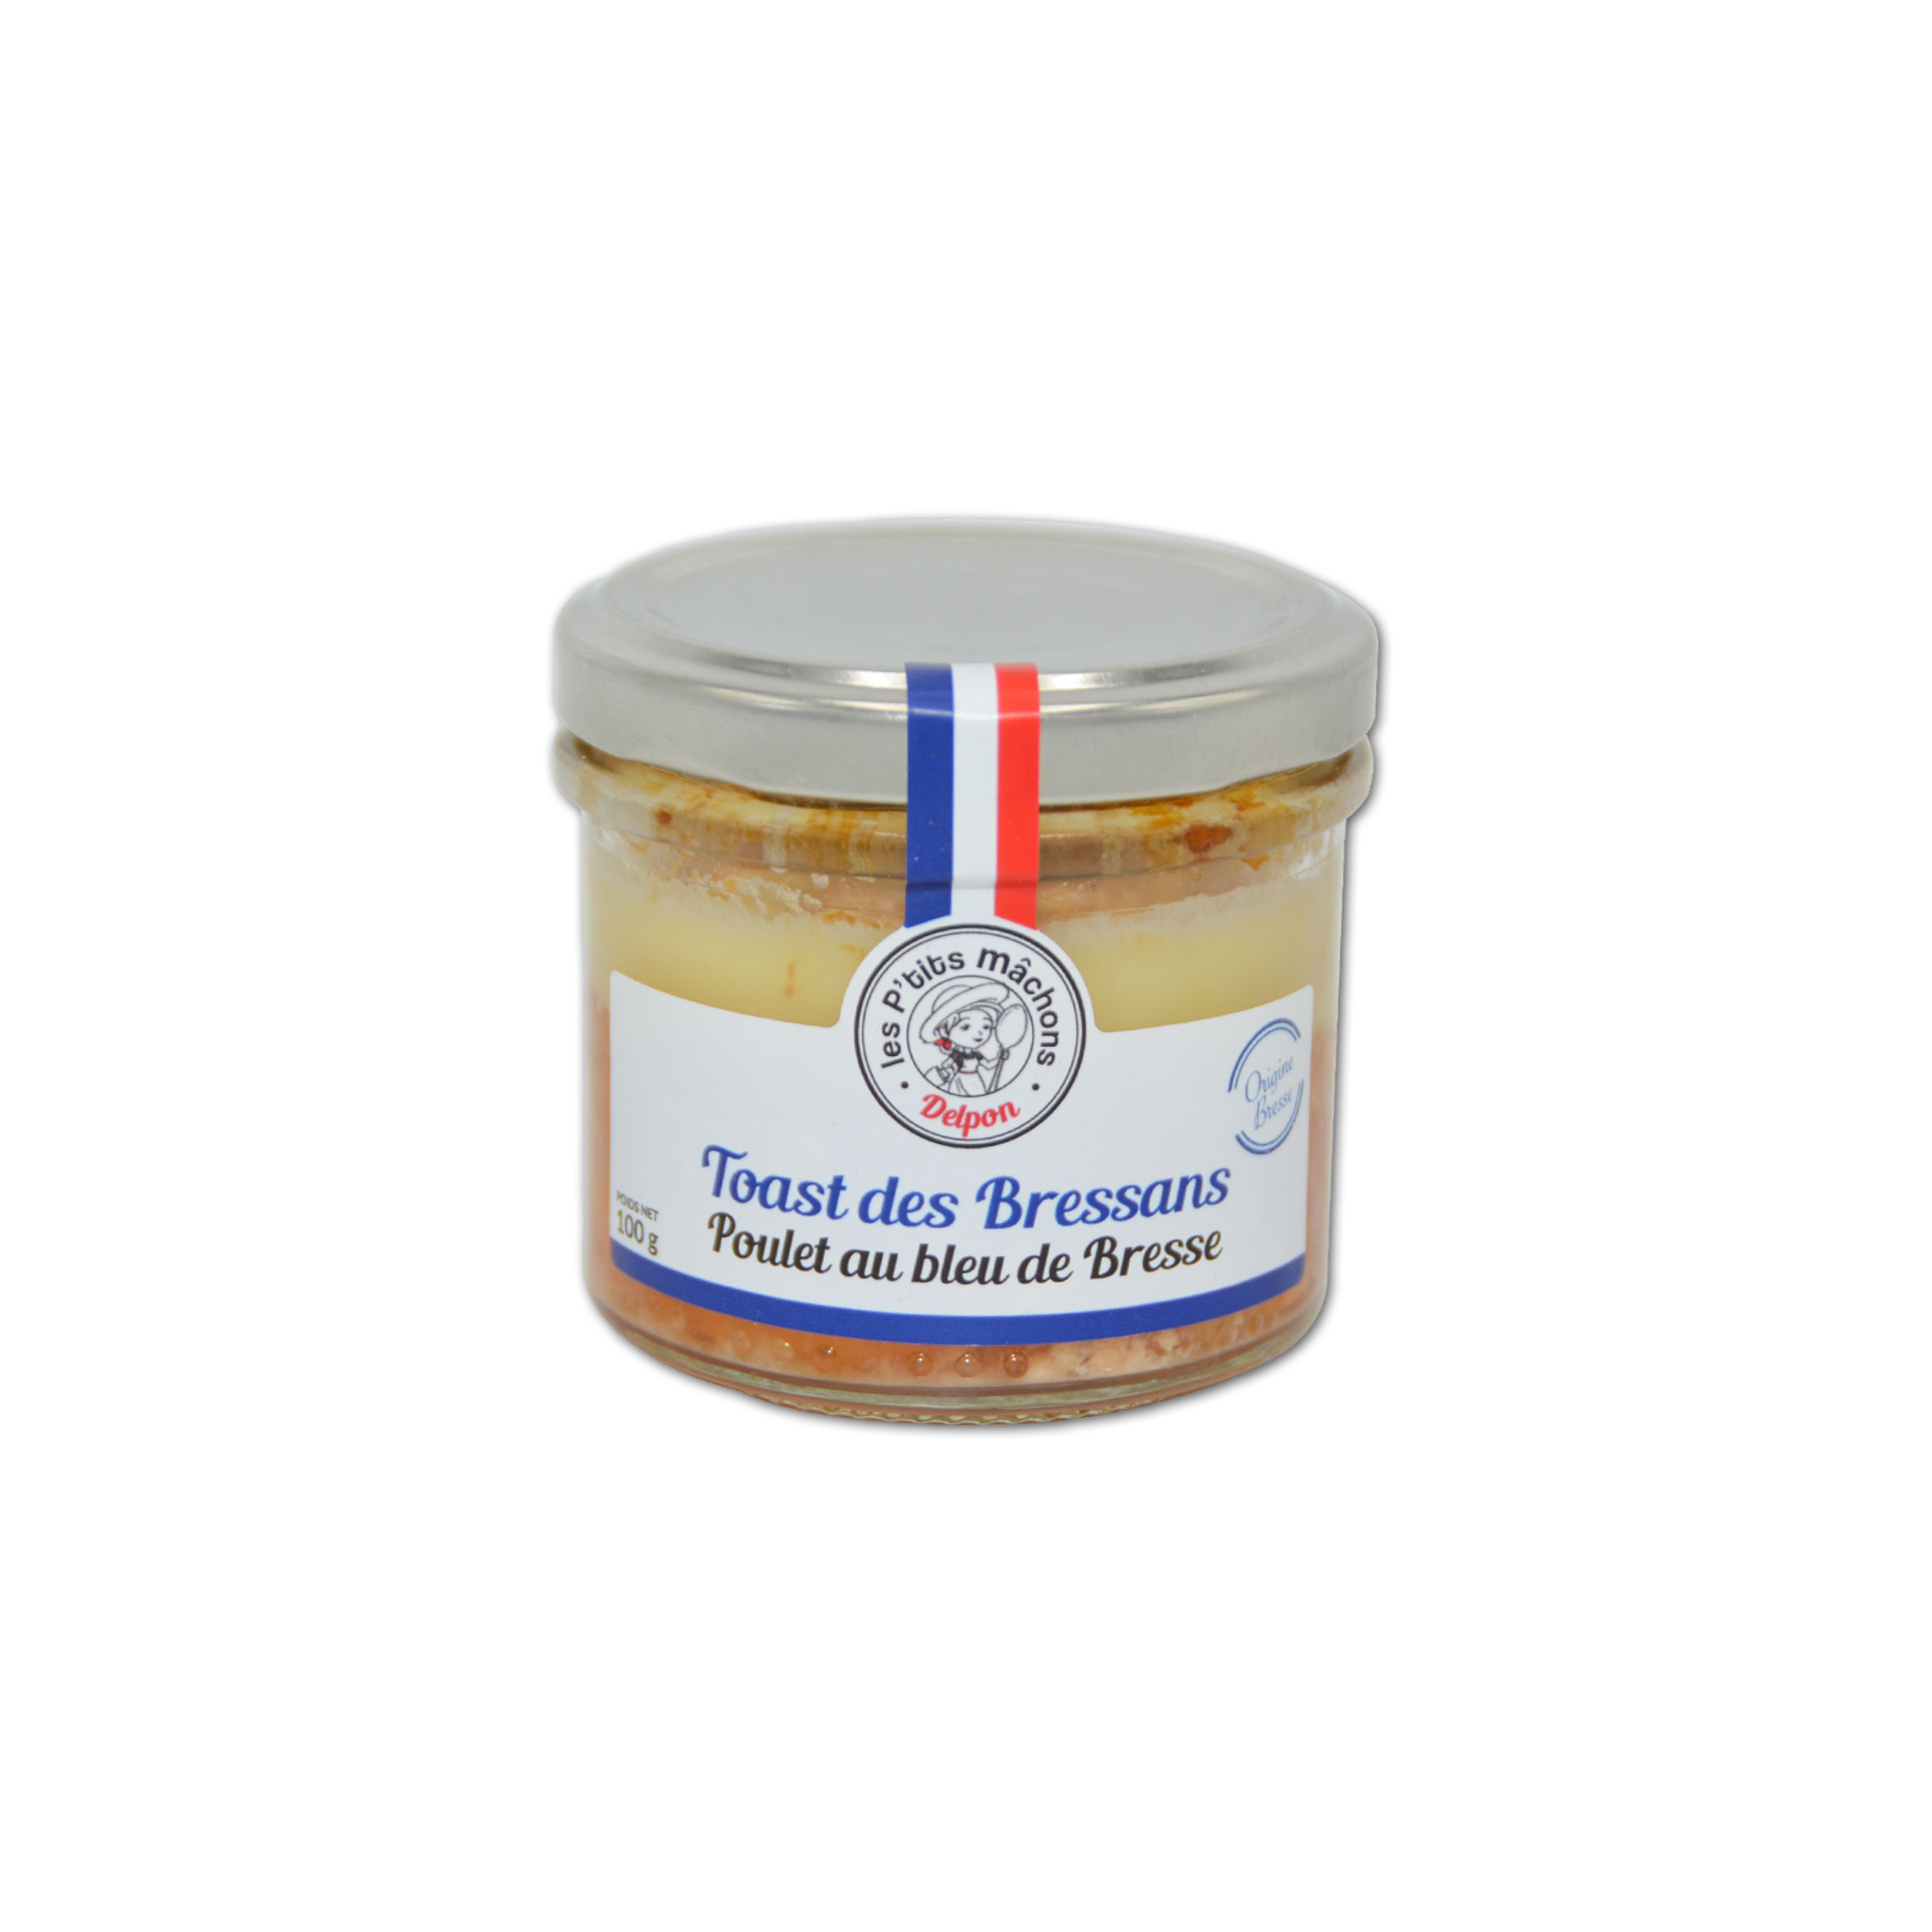 Toast des Bressans